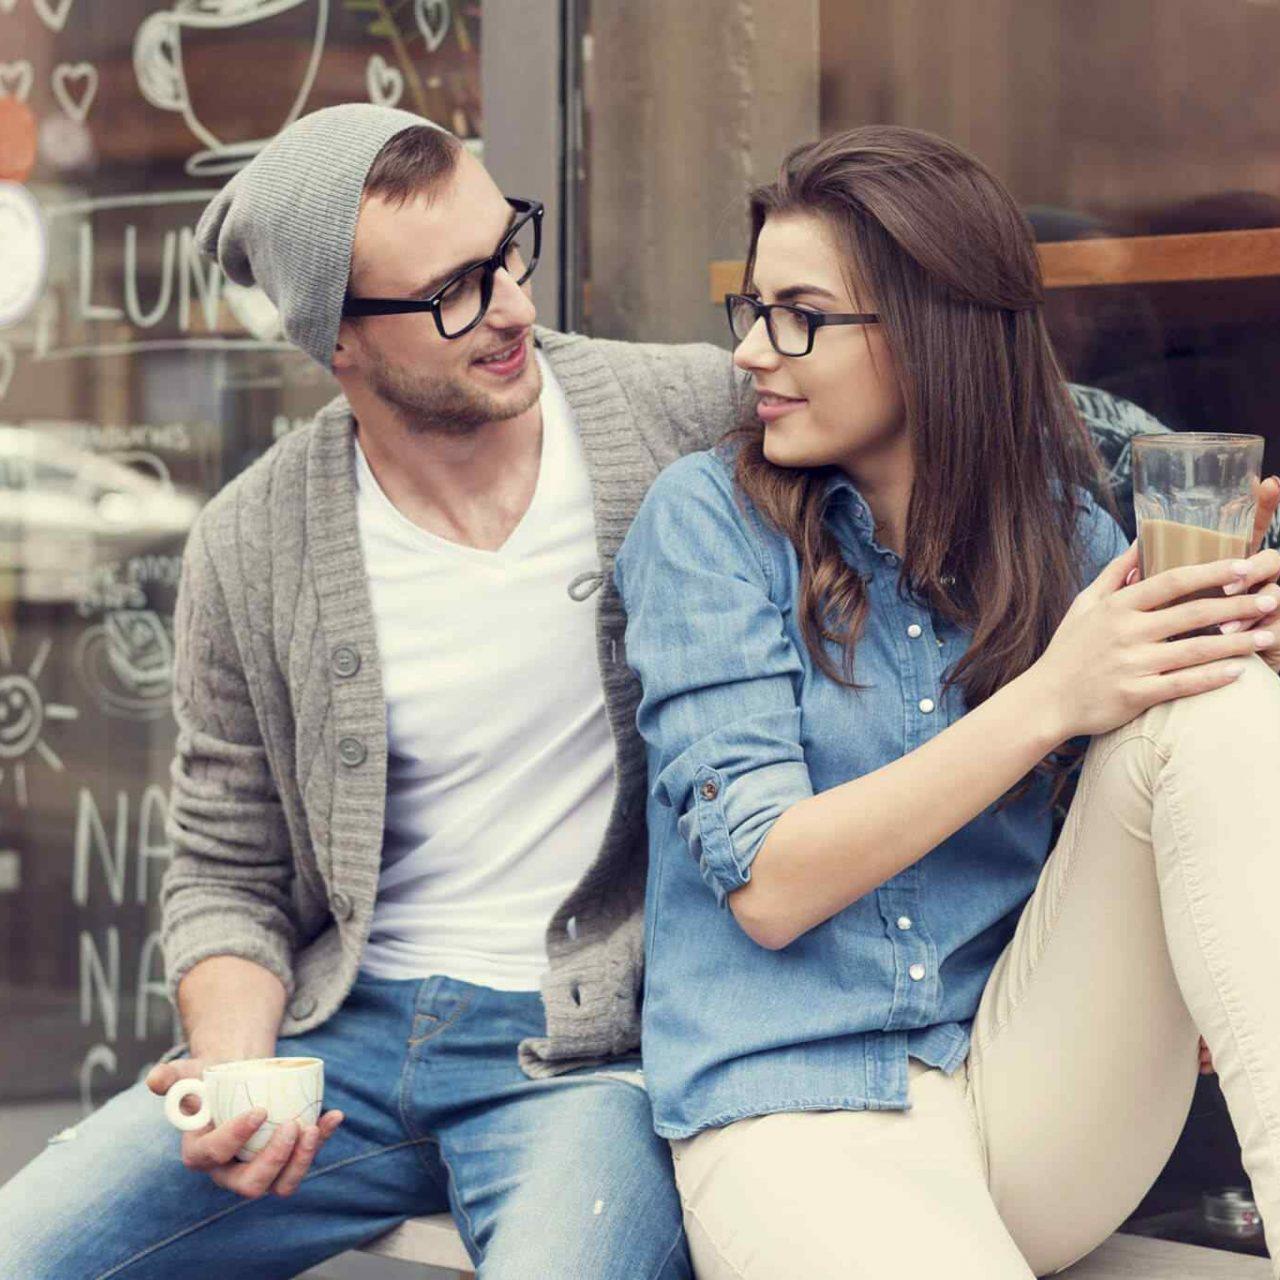 http://www.solucoaching.com/wp-content/uploads/2018/01/img-class-marriage-02-1280x1280.jpg